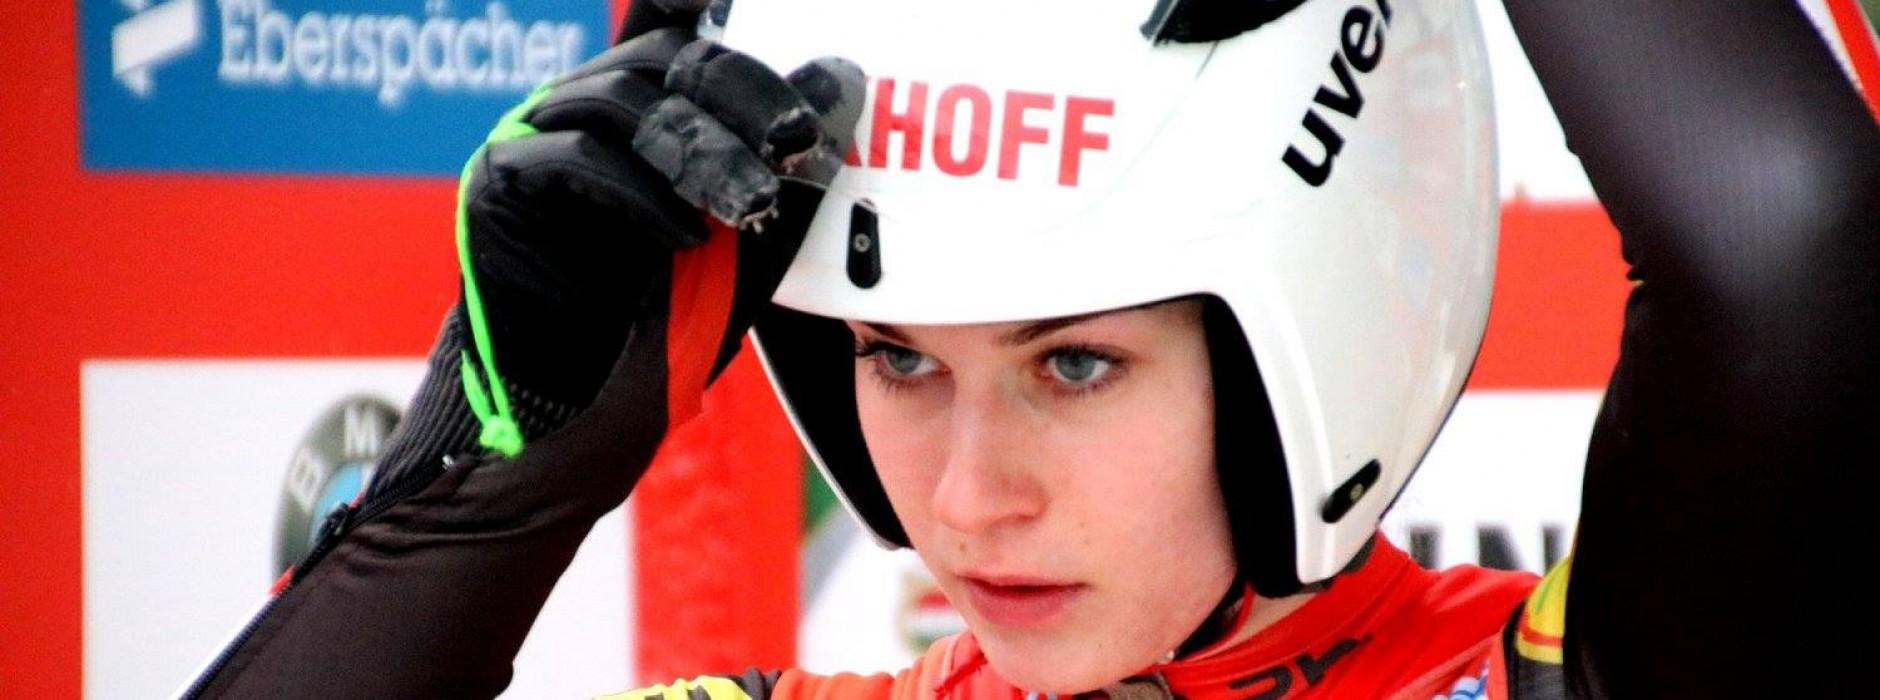 Katrin Heinzelmaier